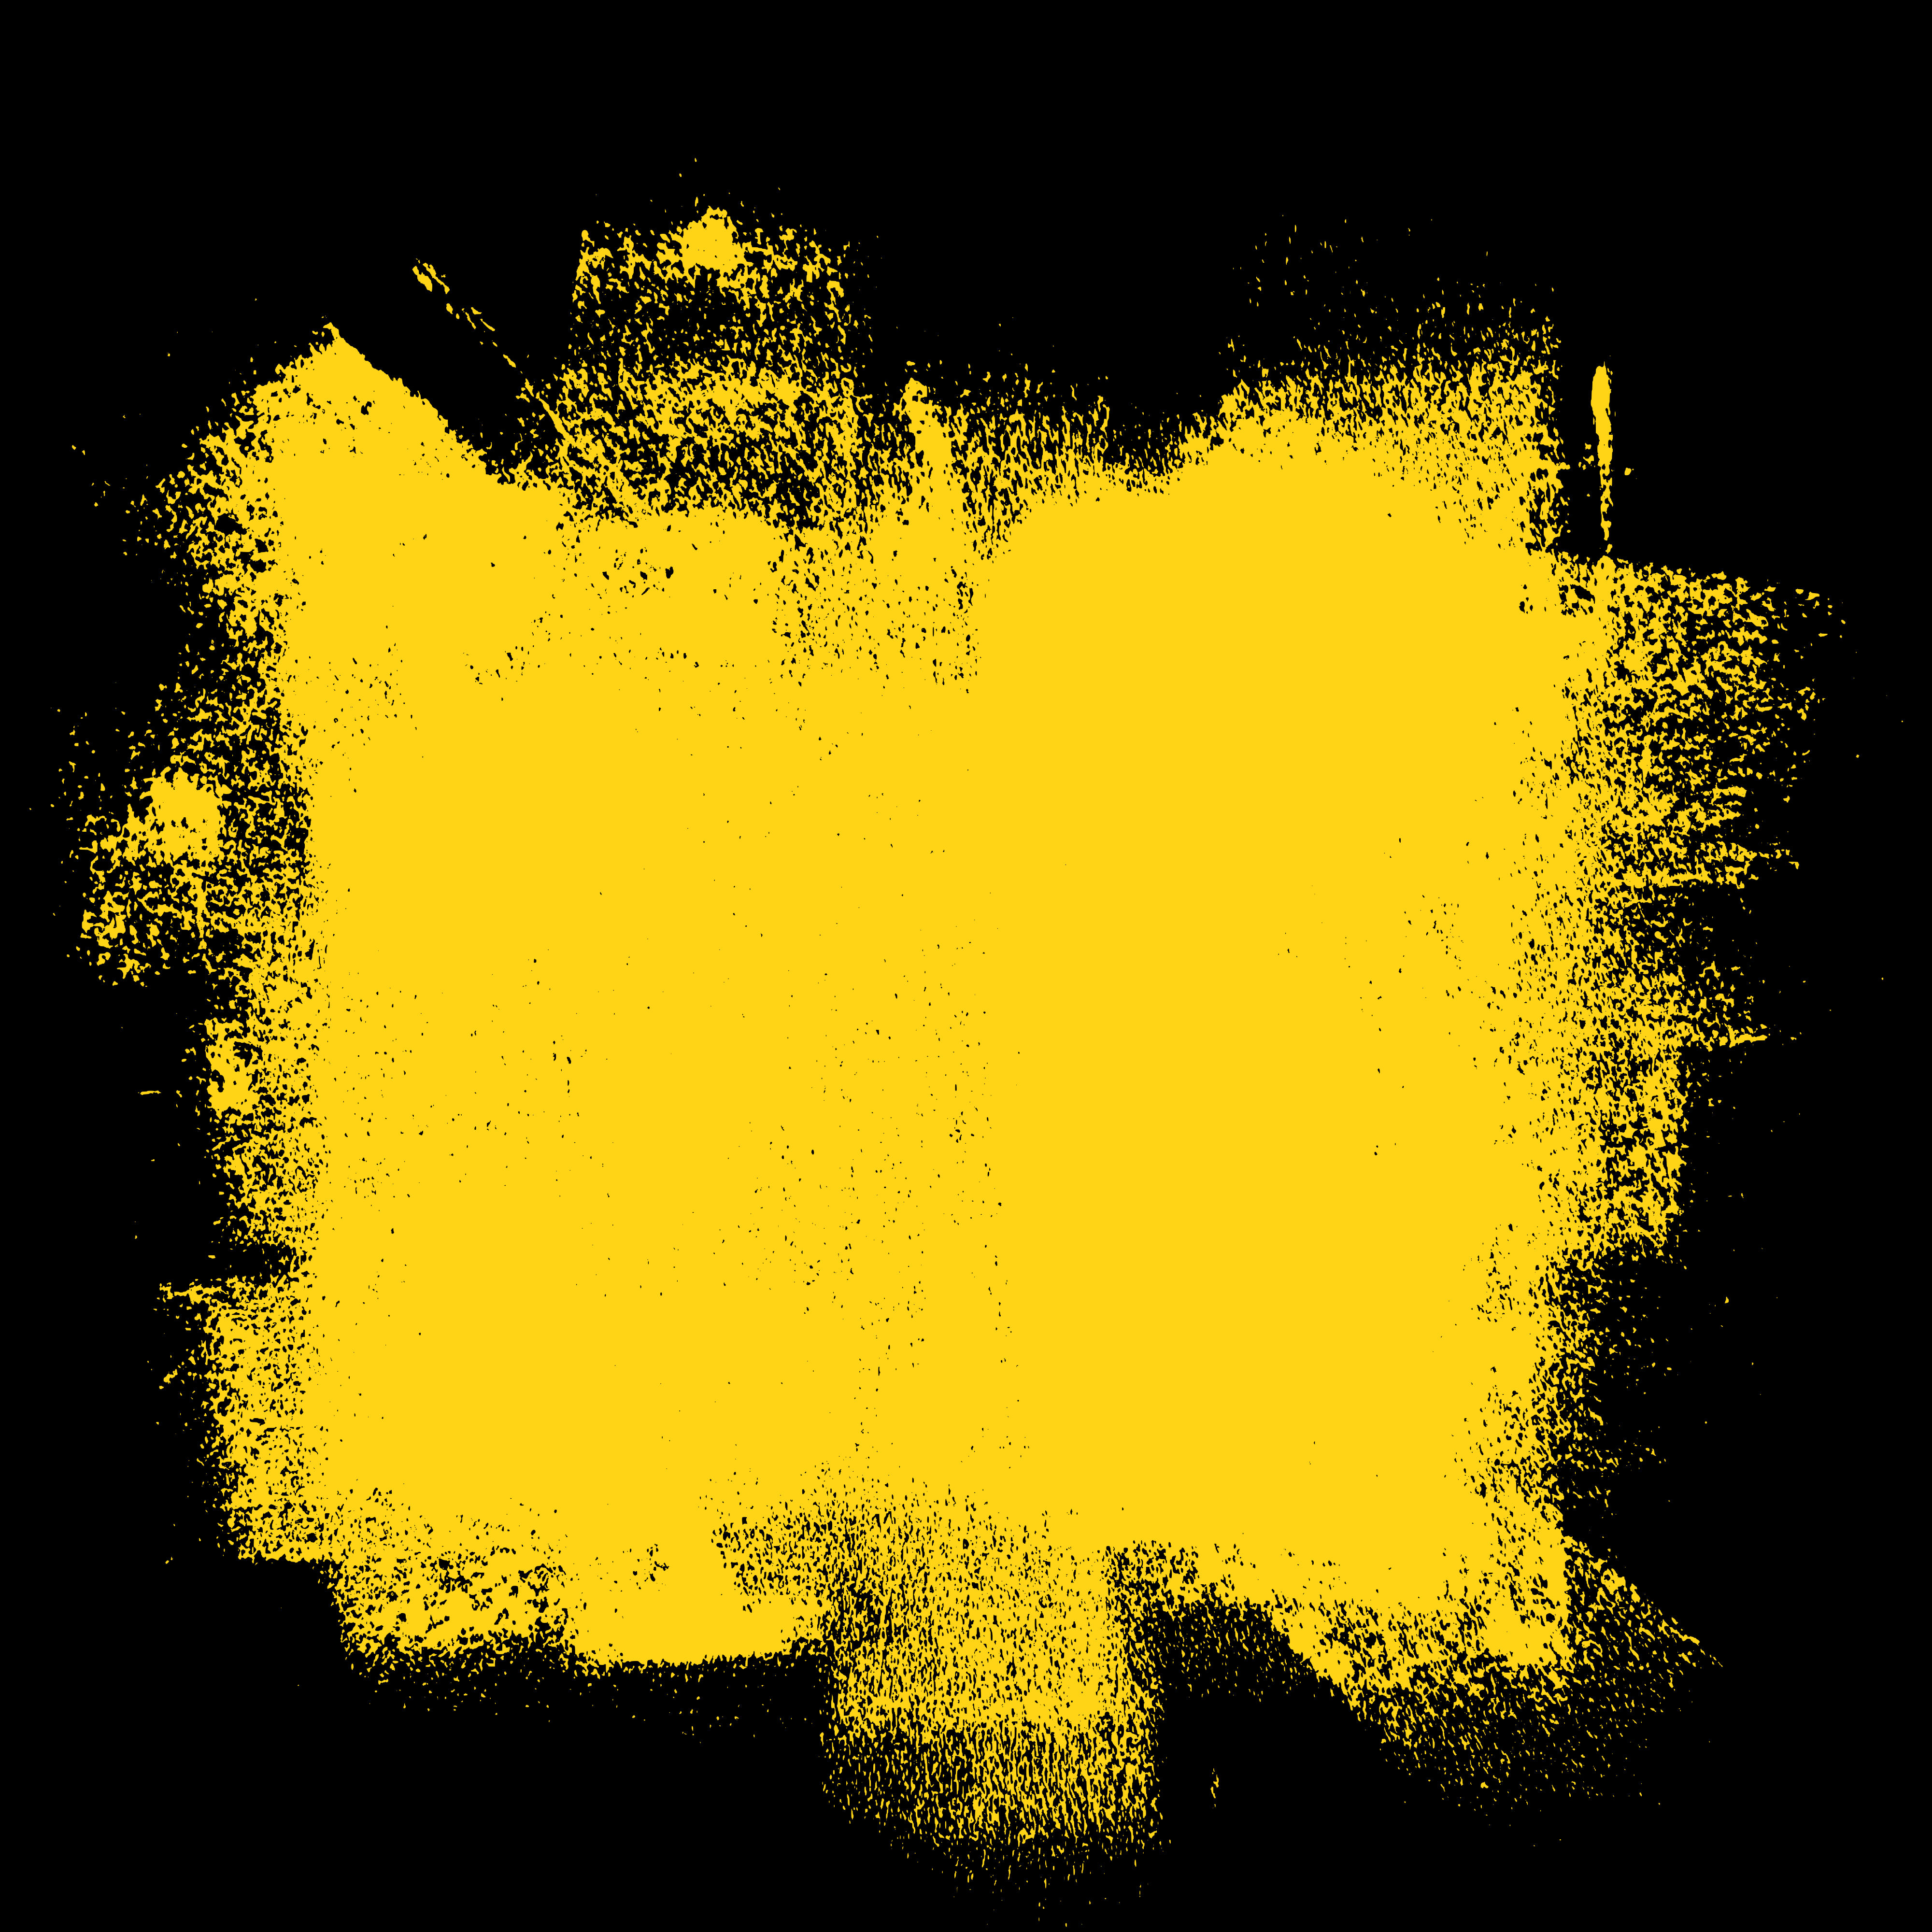 Yellow Black Grunge Background (JPG) | OnlyGFX.com